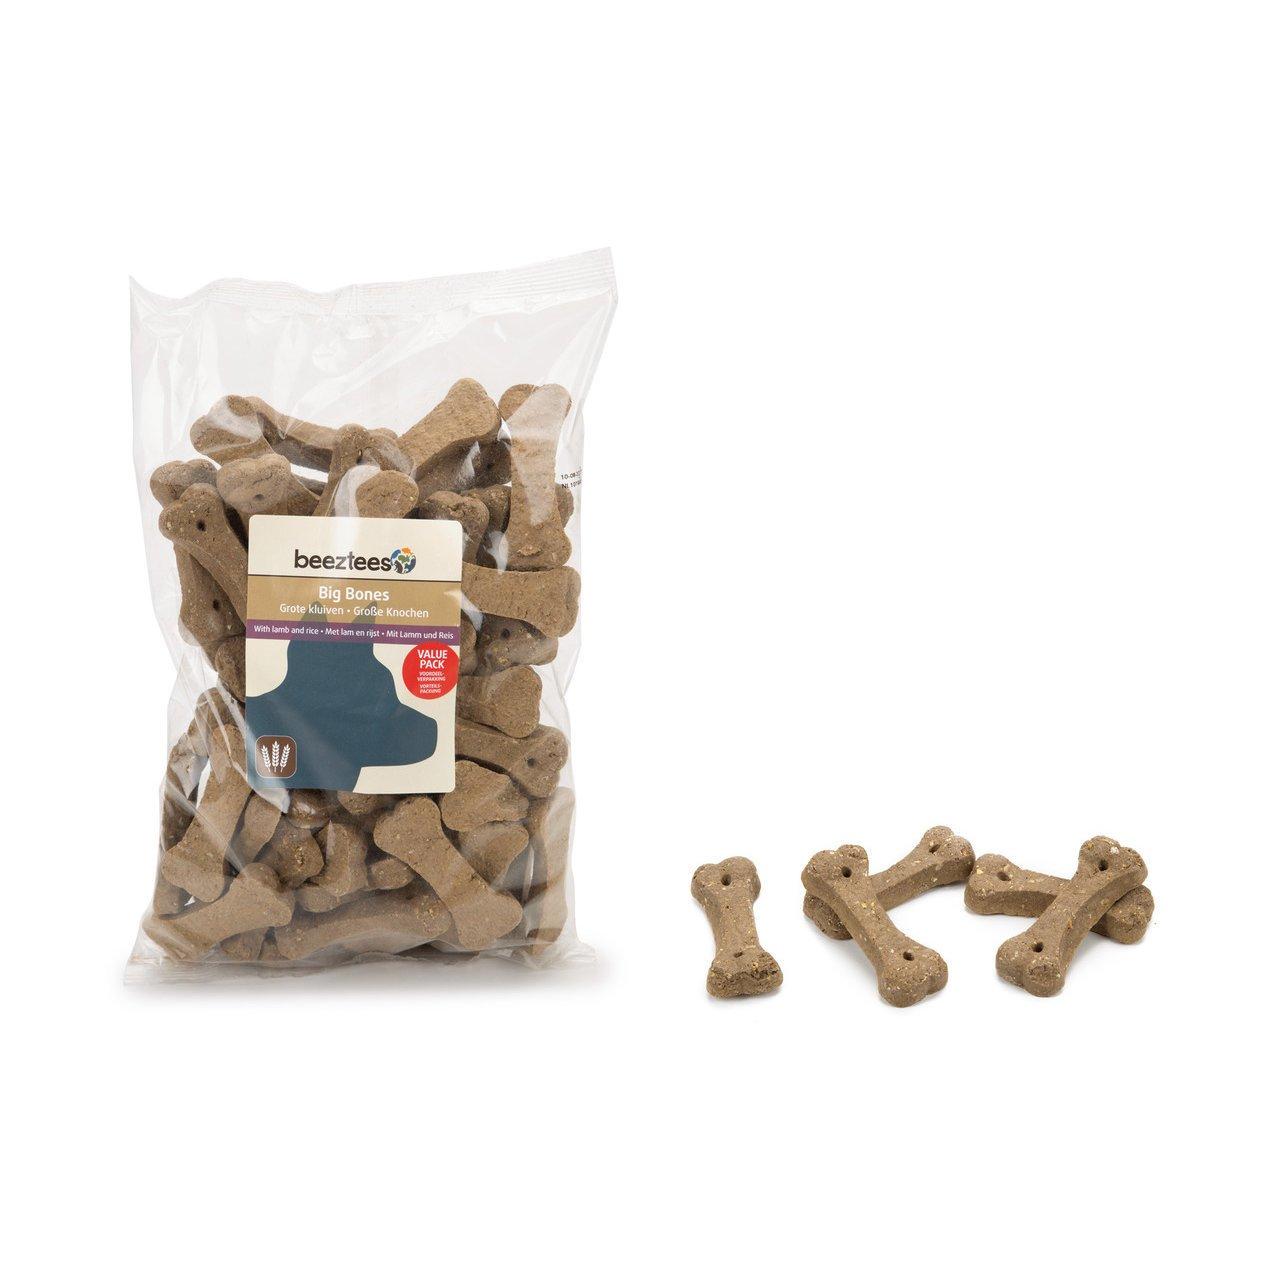 Beeztees Hundekekse, 1000 g / Lamm und Reis